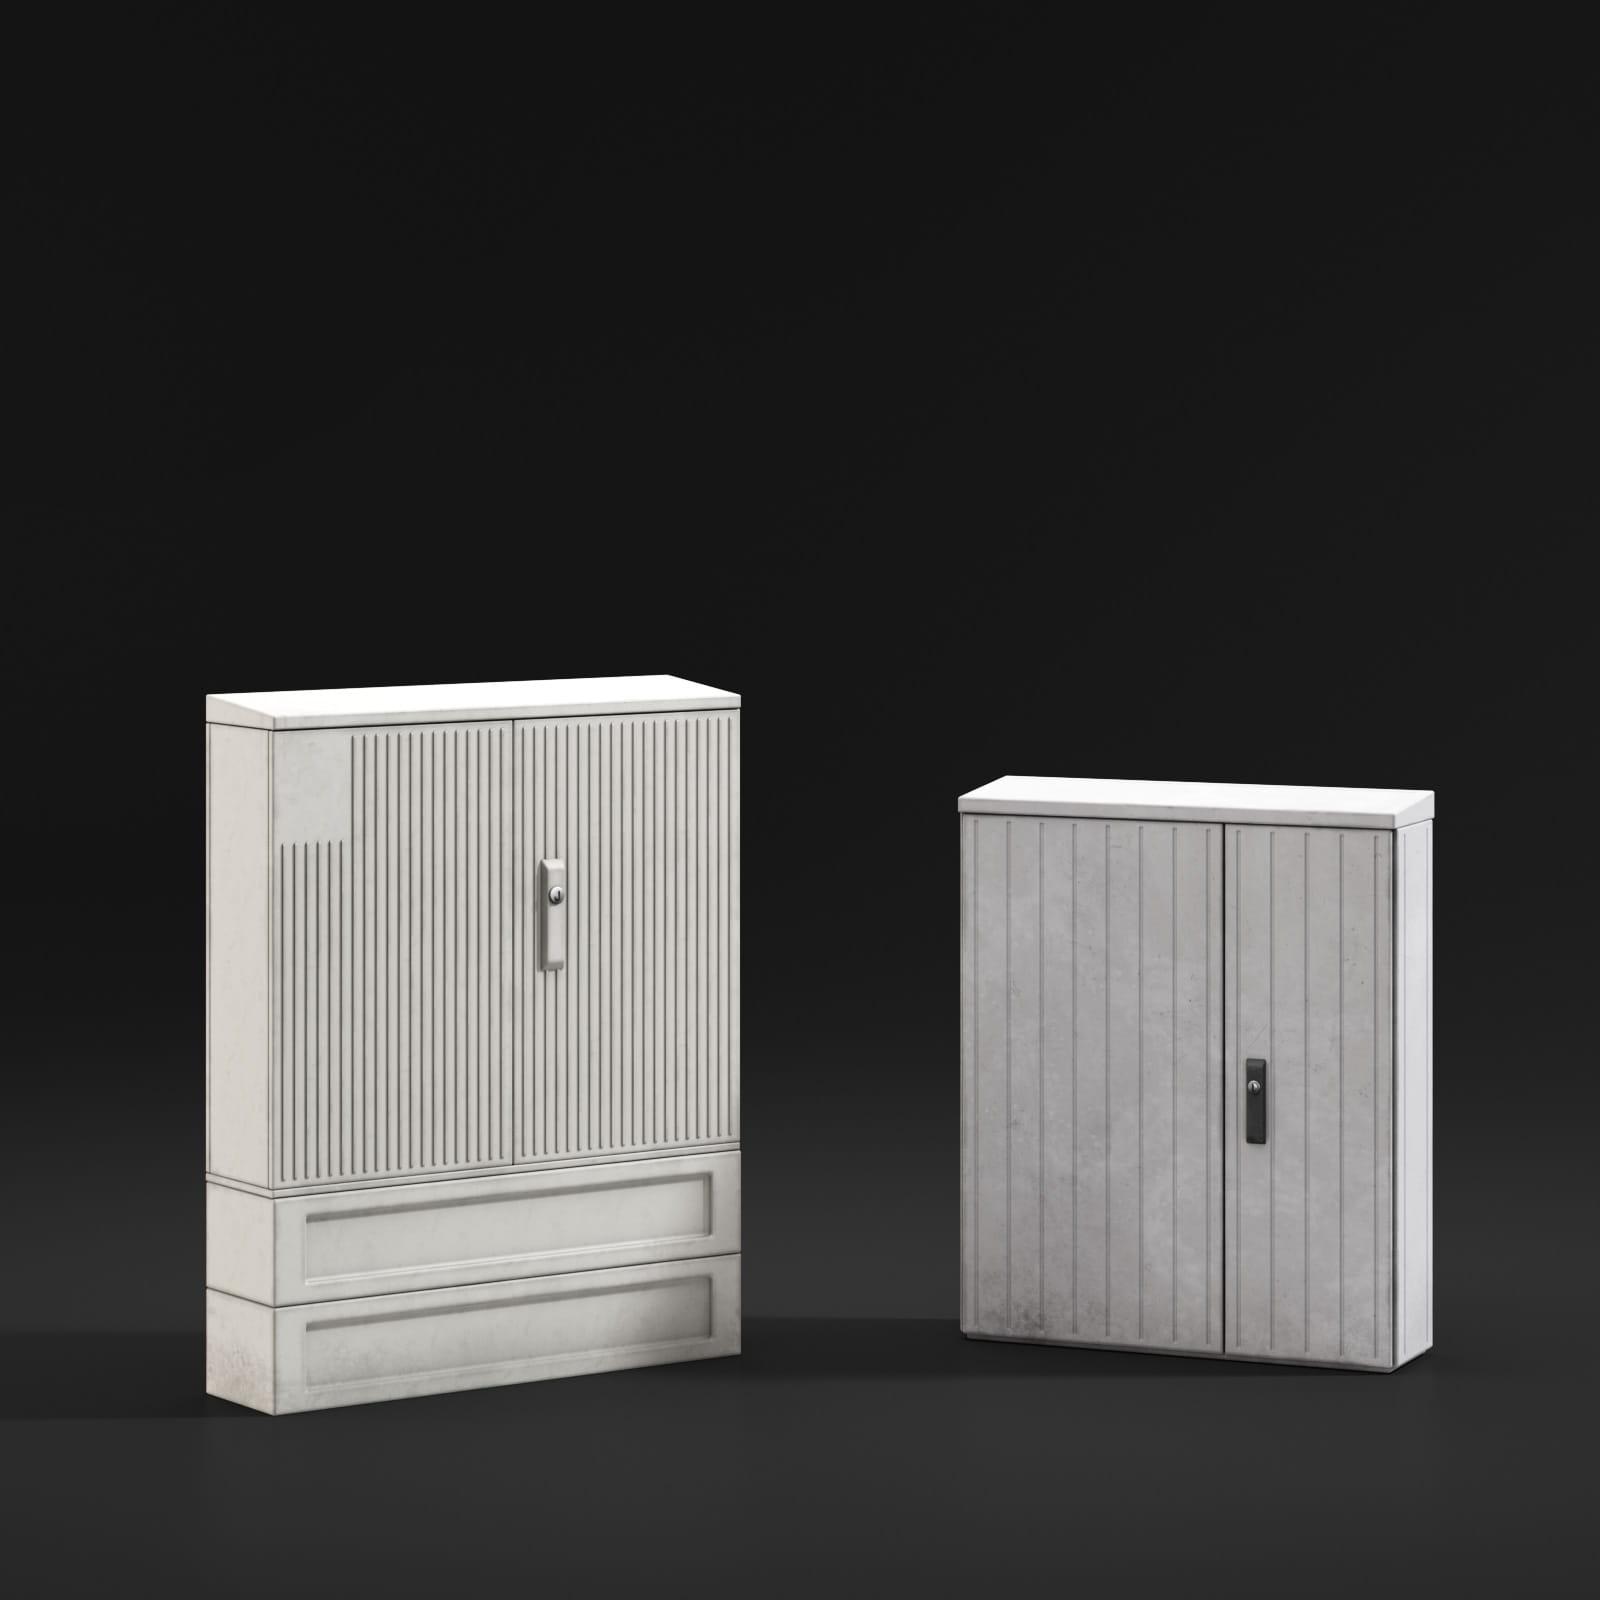 transformer boxes 11 AM211 Archmodels